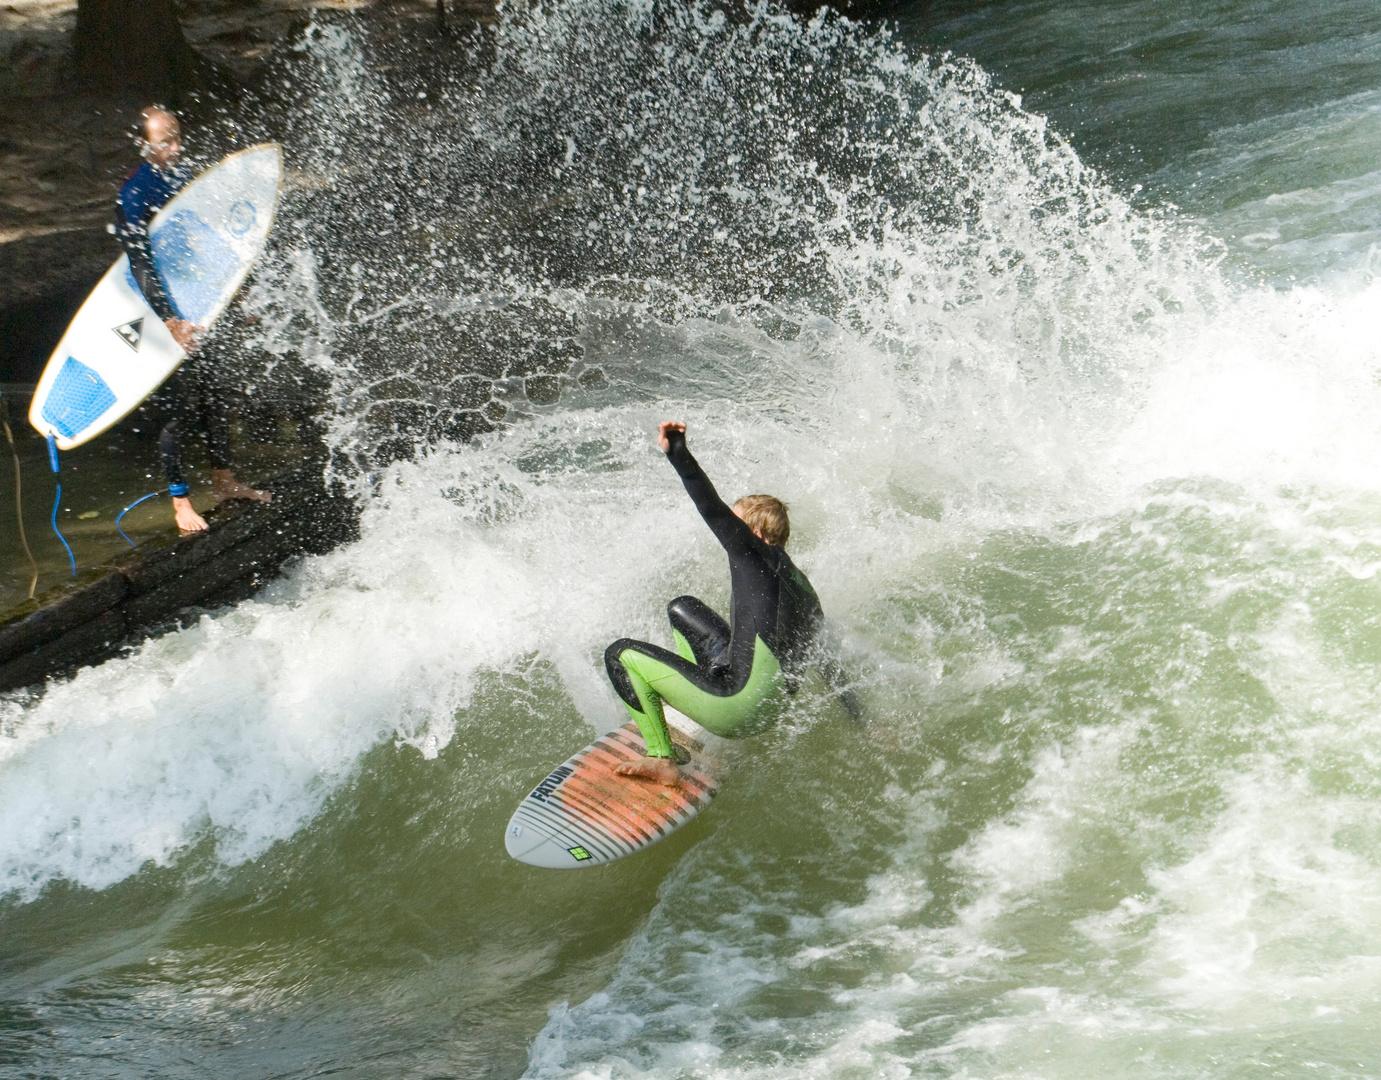 Kanalsurfer 1